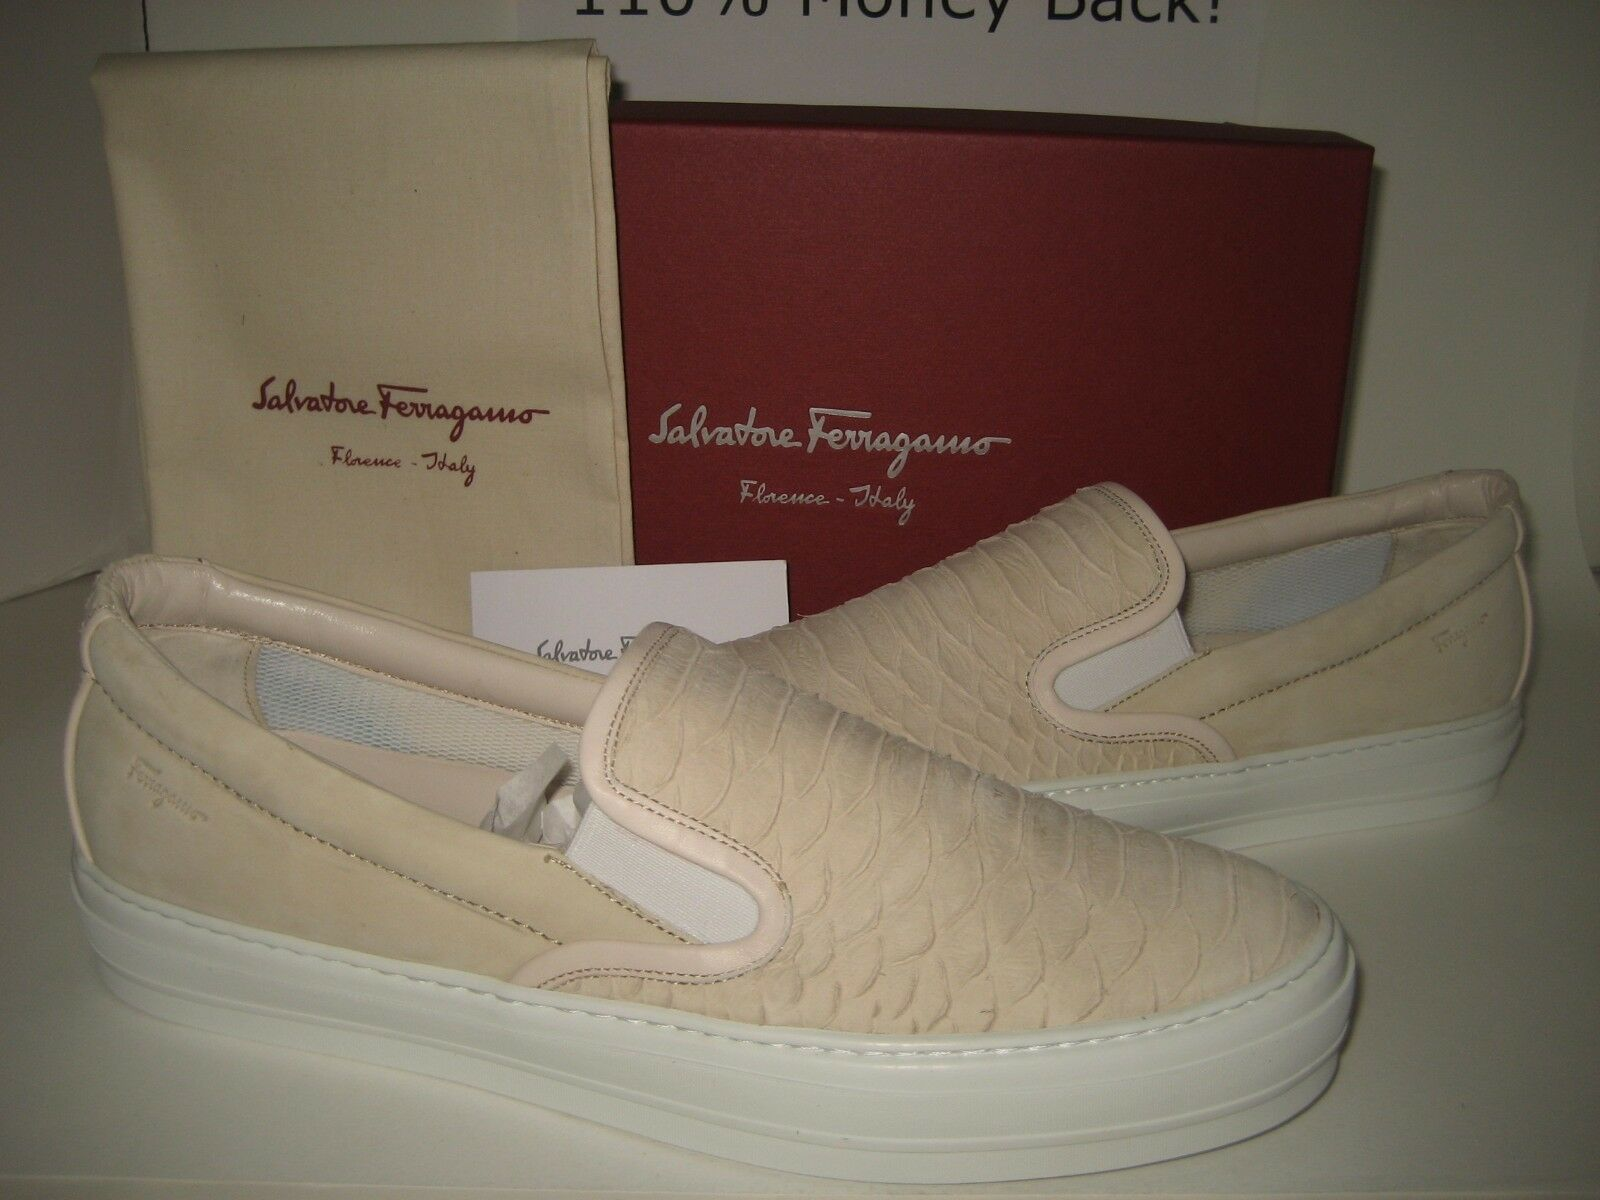 NEW Salvatore Ferragamo Women US 9.5 Pacau Suede Leather Sneakers shoes BOX